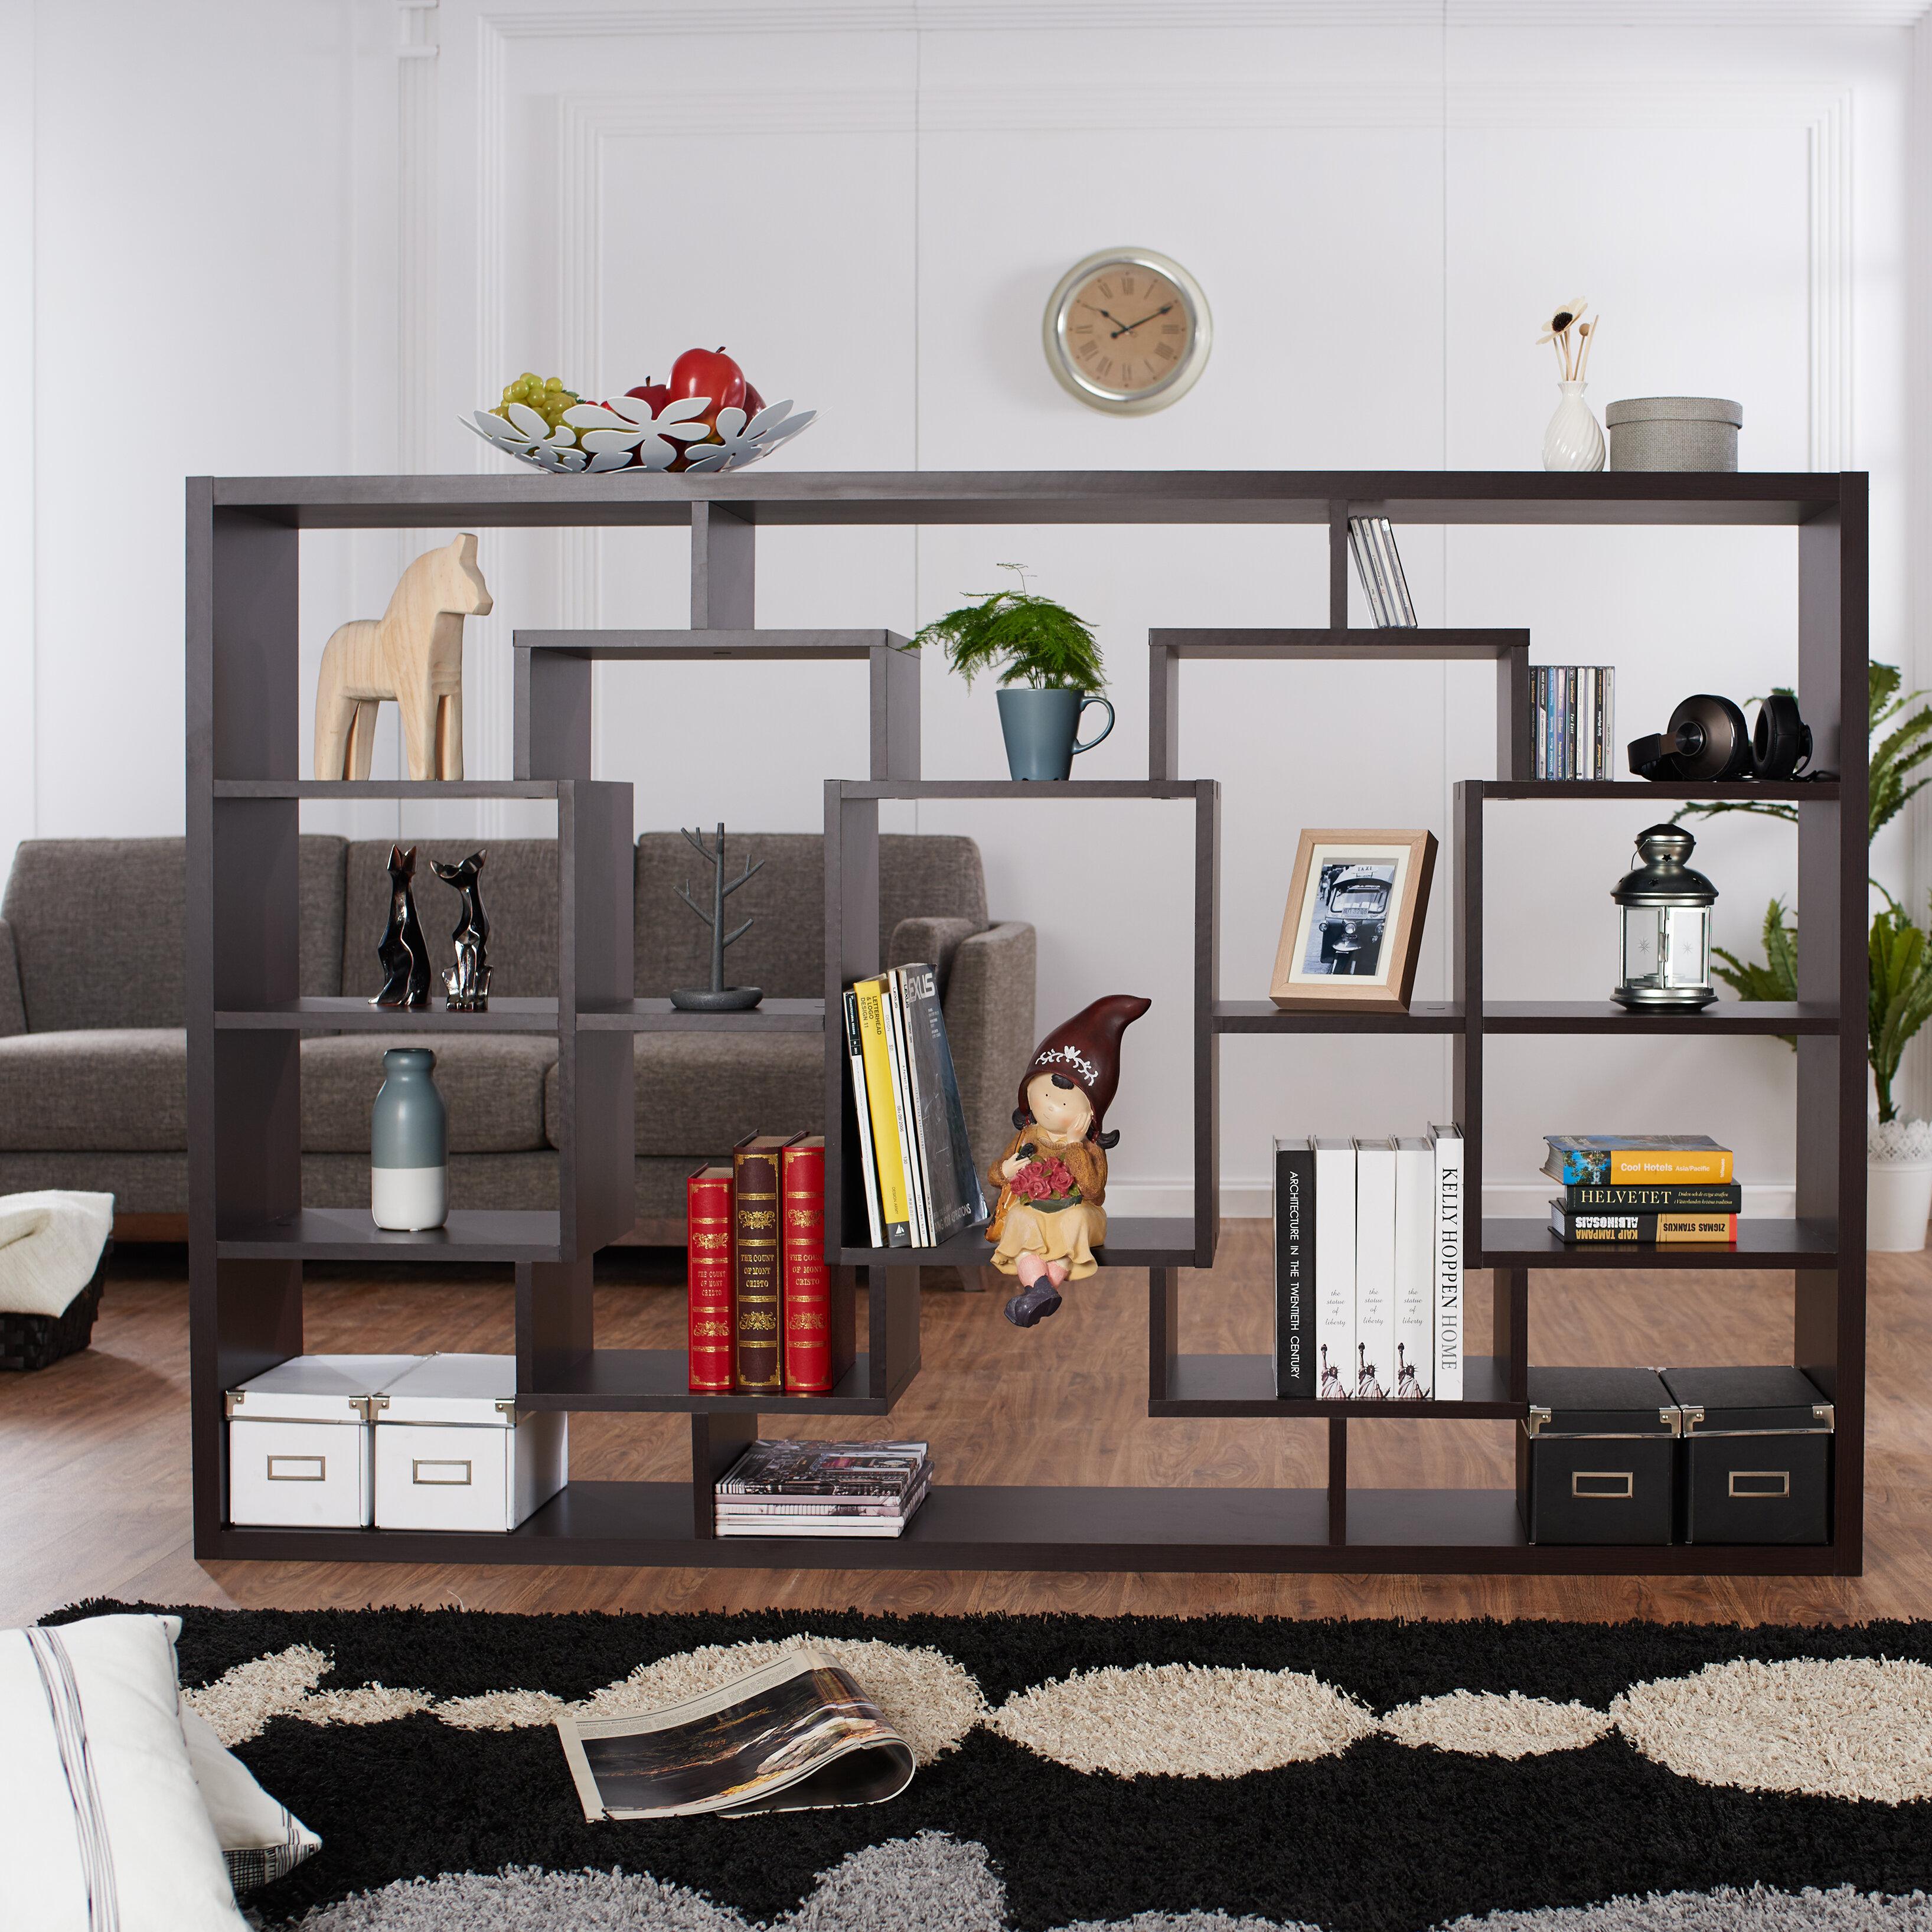 darby bookshelf pdx lular home reviews wayfair etagere co furniture under window bookcase